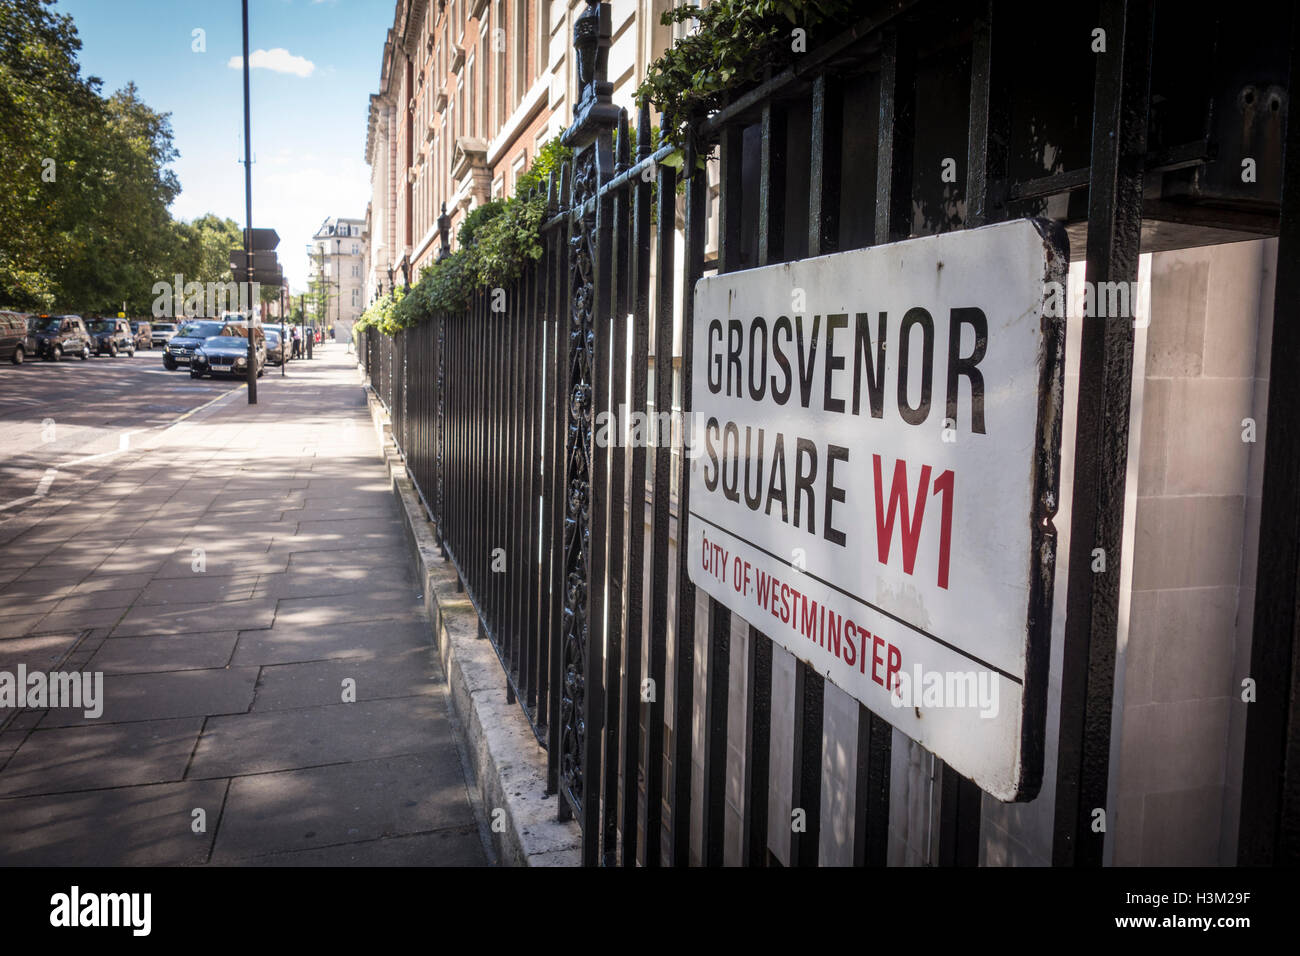 Grosvenor Square sign, Westminster, London, UK - Stock Image